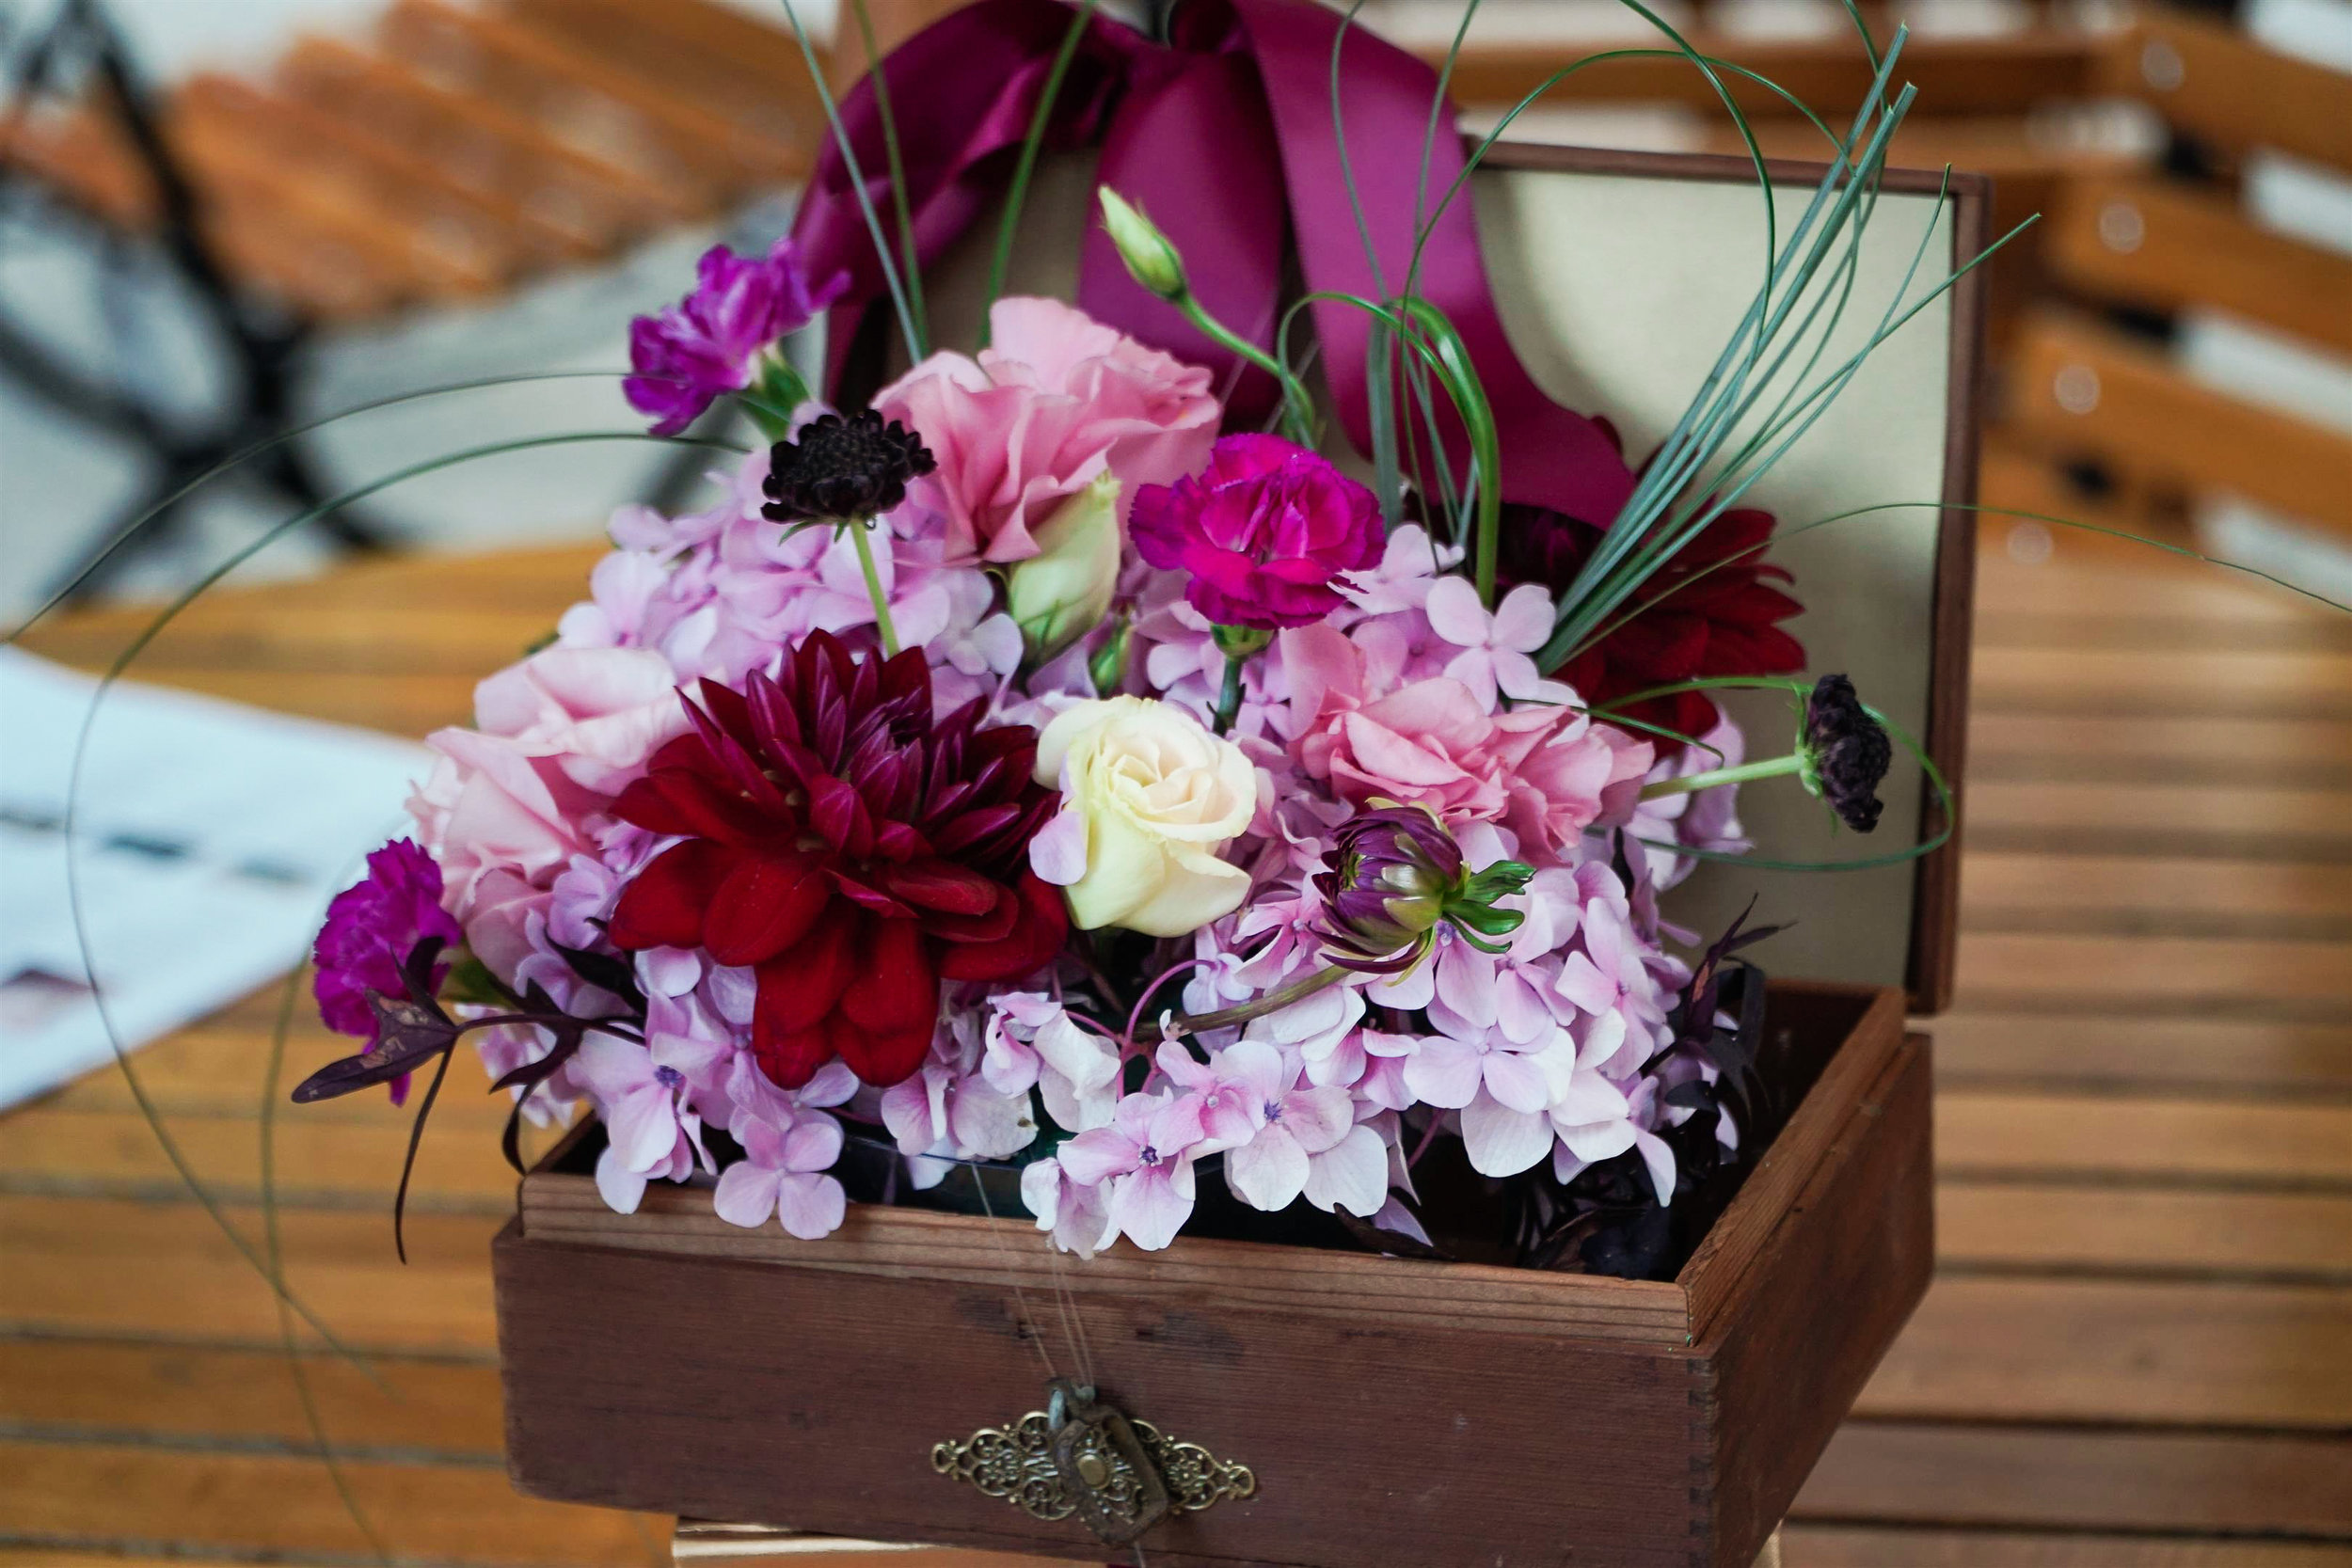 Floral arrangement in a wooden box